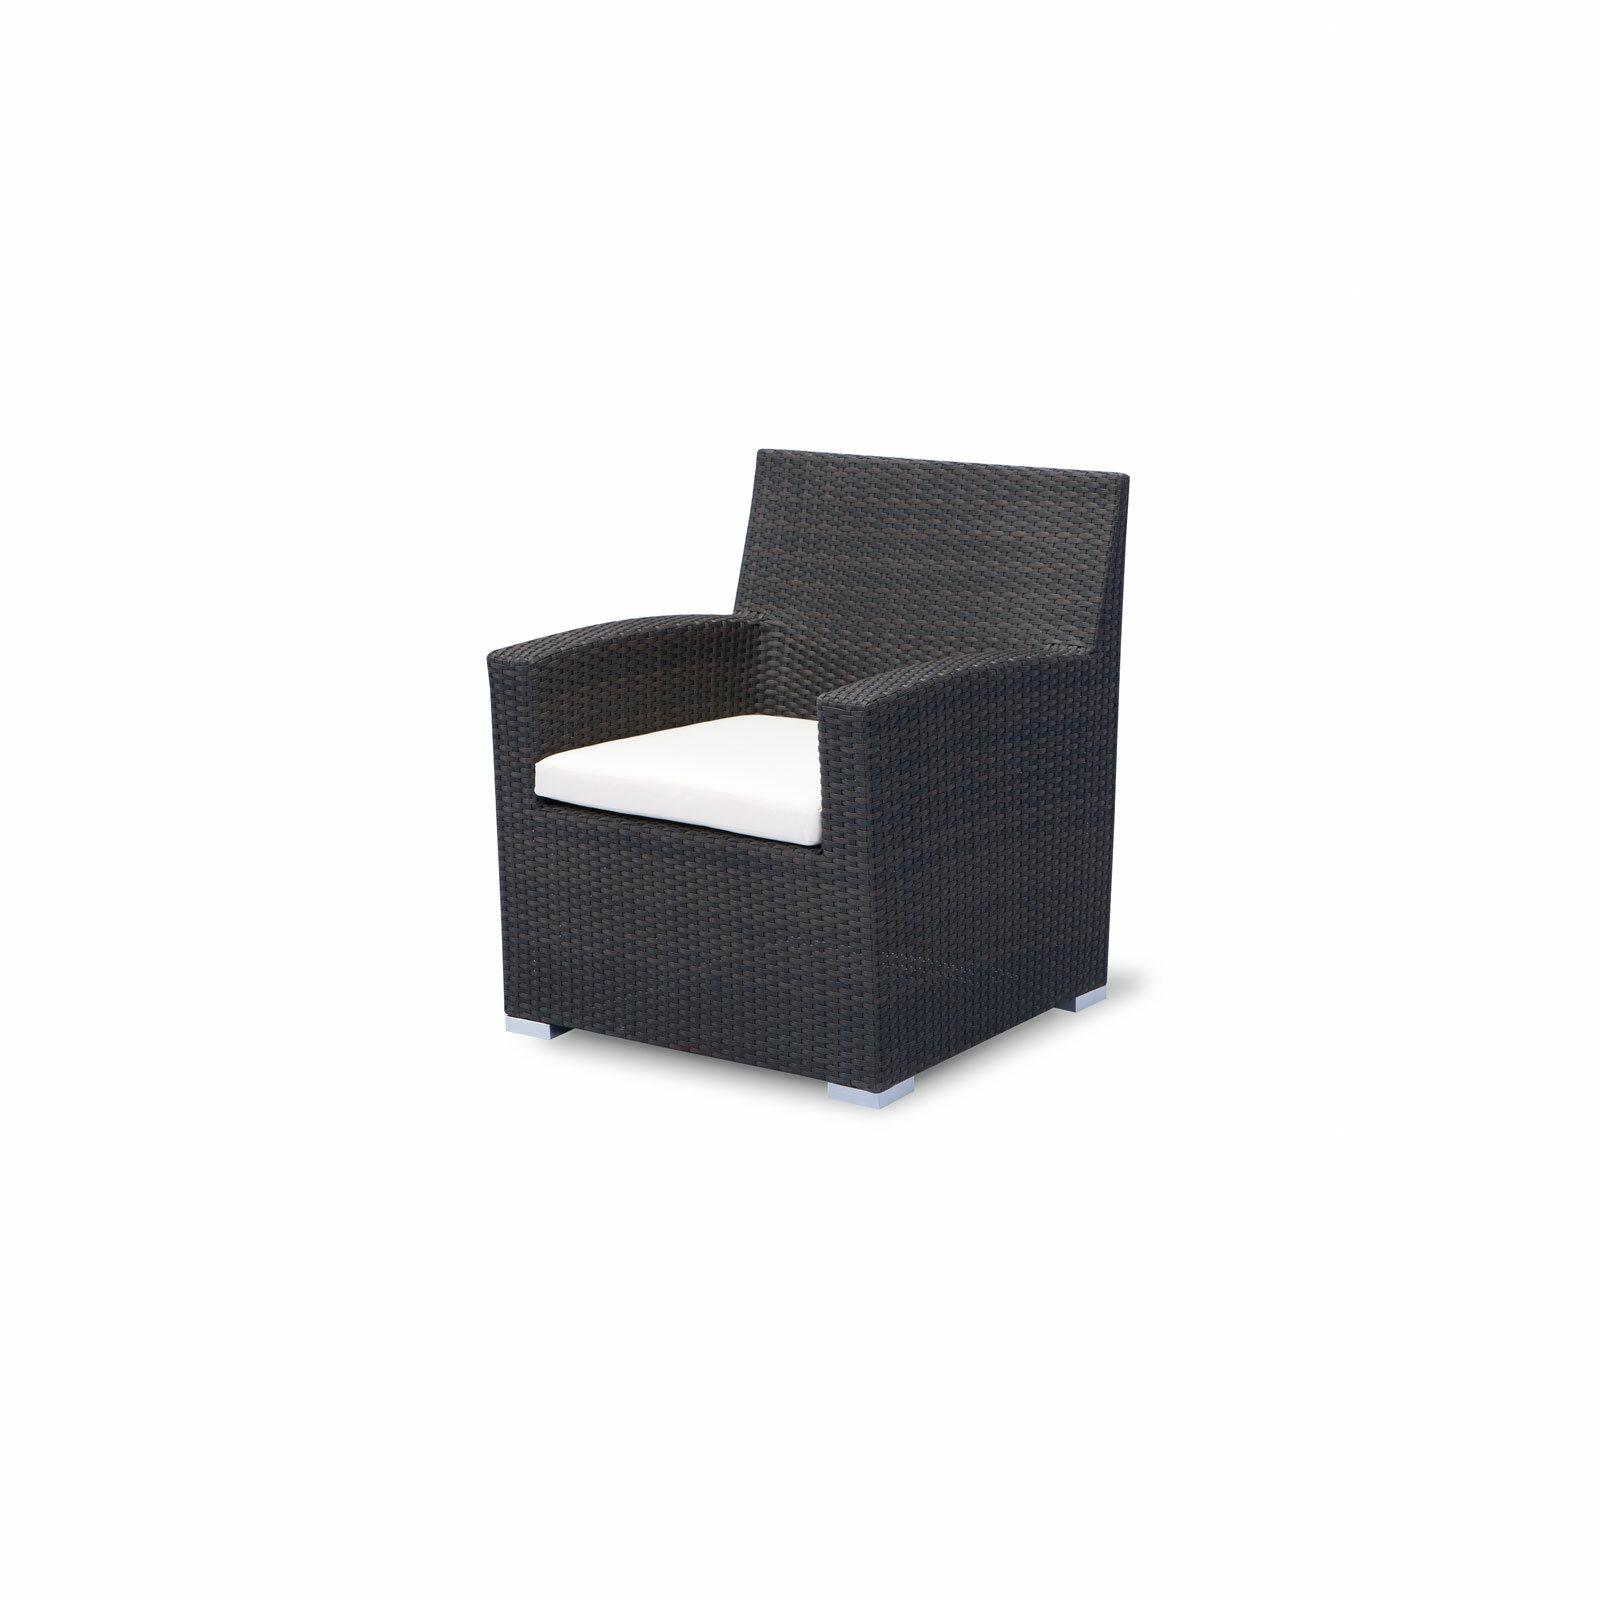 Wondrous Roose Lounge Chair Machost Co Dining Chair Design Ideas Machostcouk